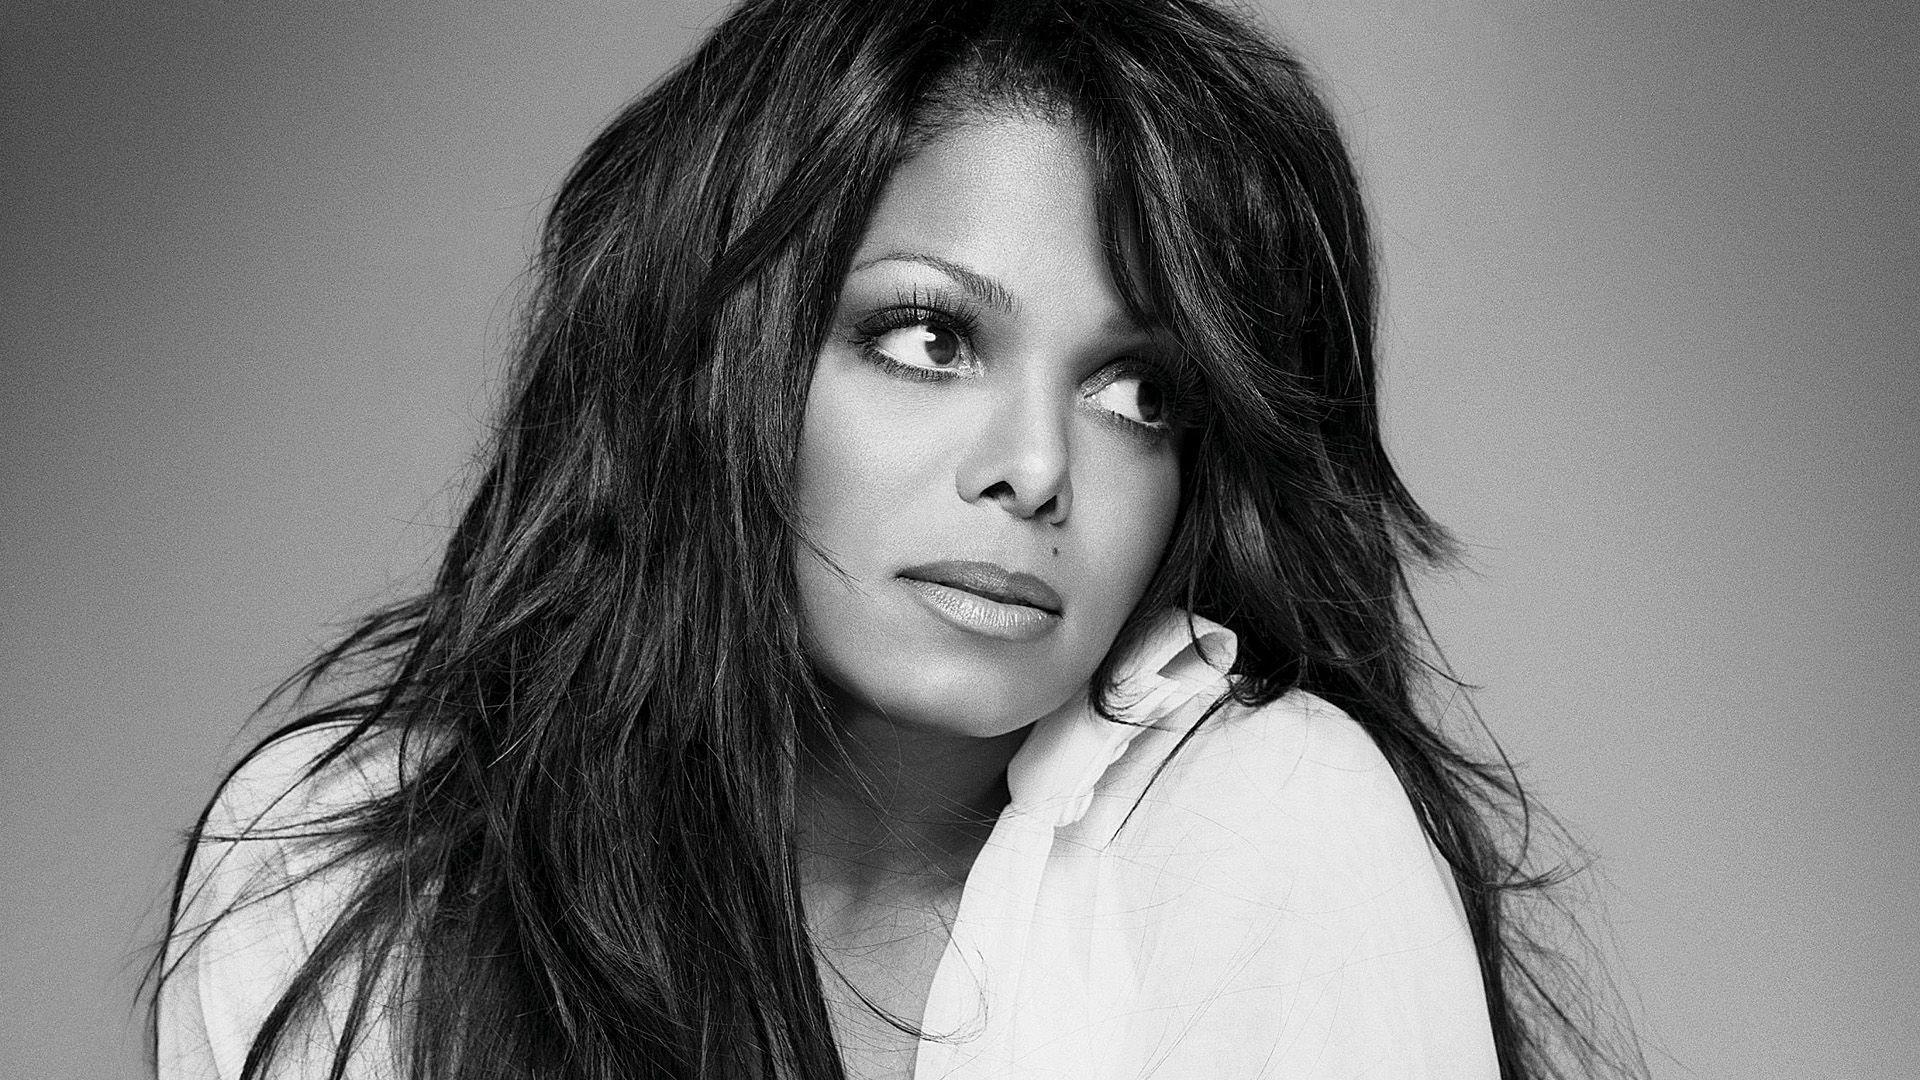 Janet Jackson Wallpaper | Nupemagz